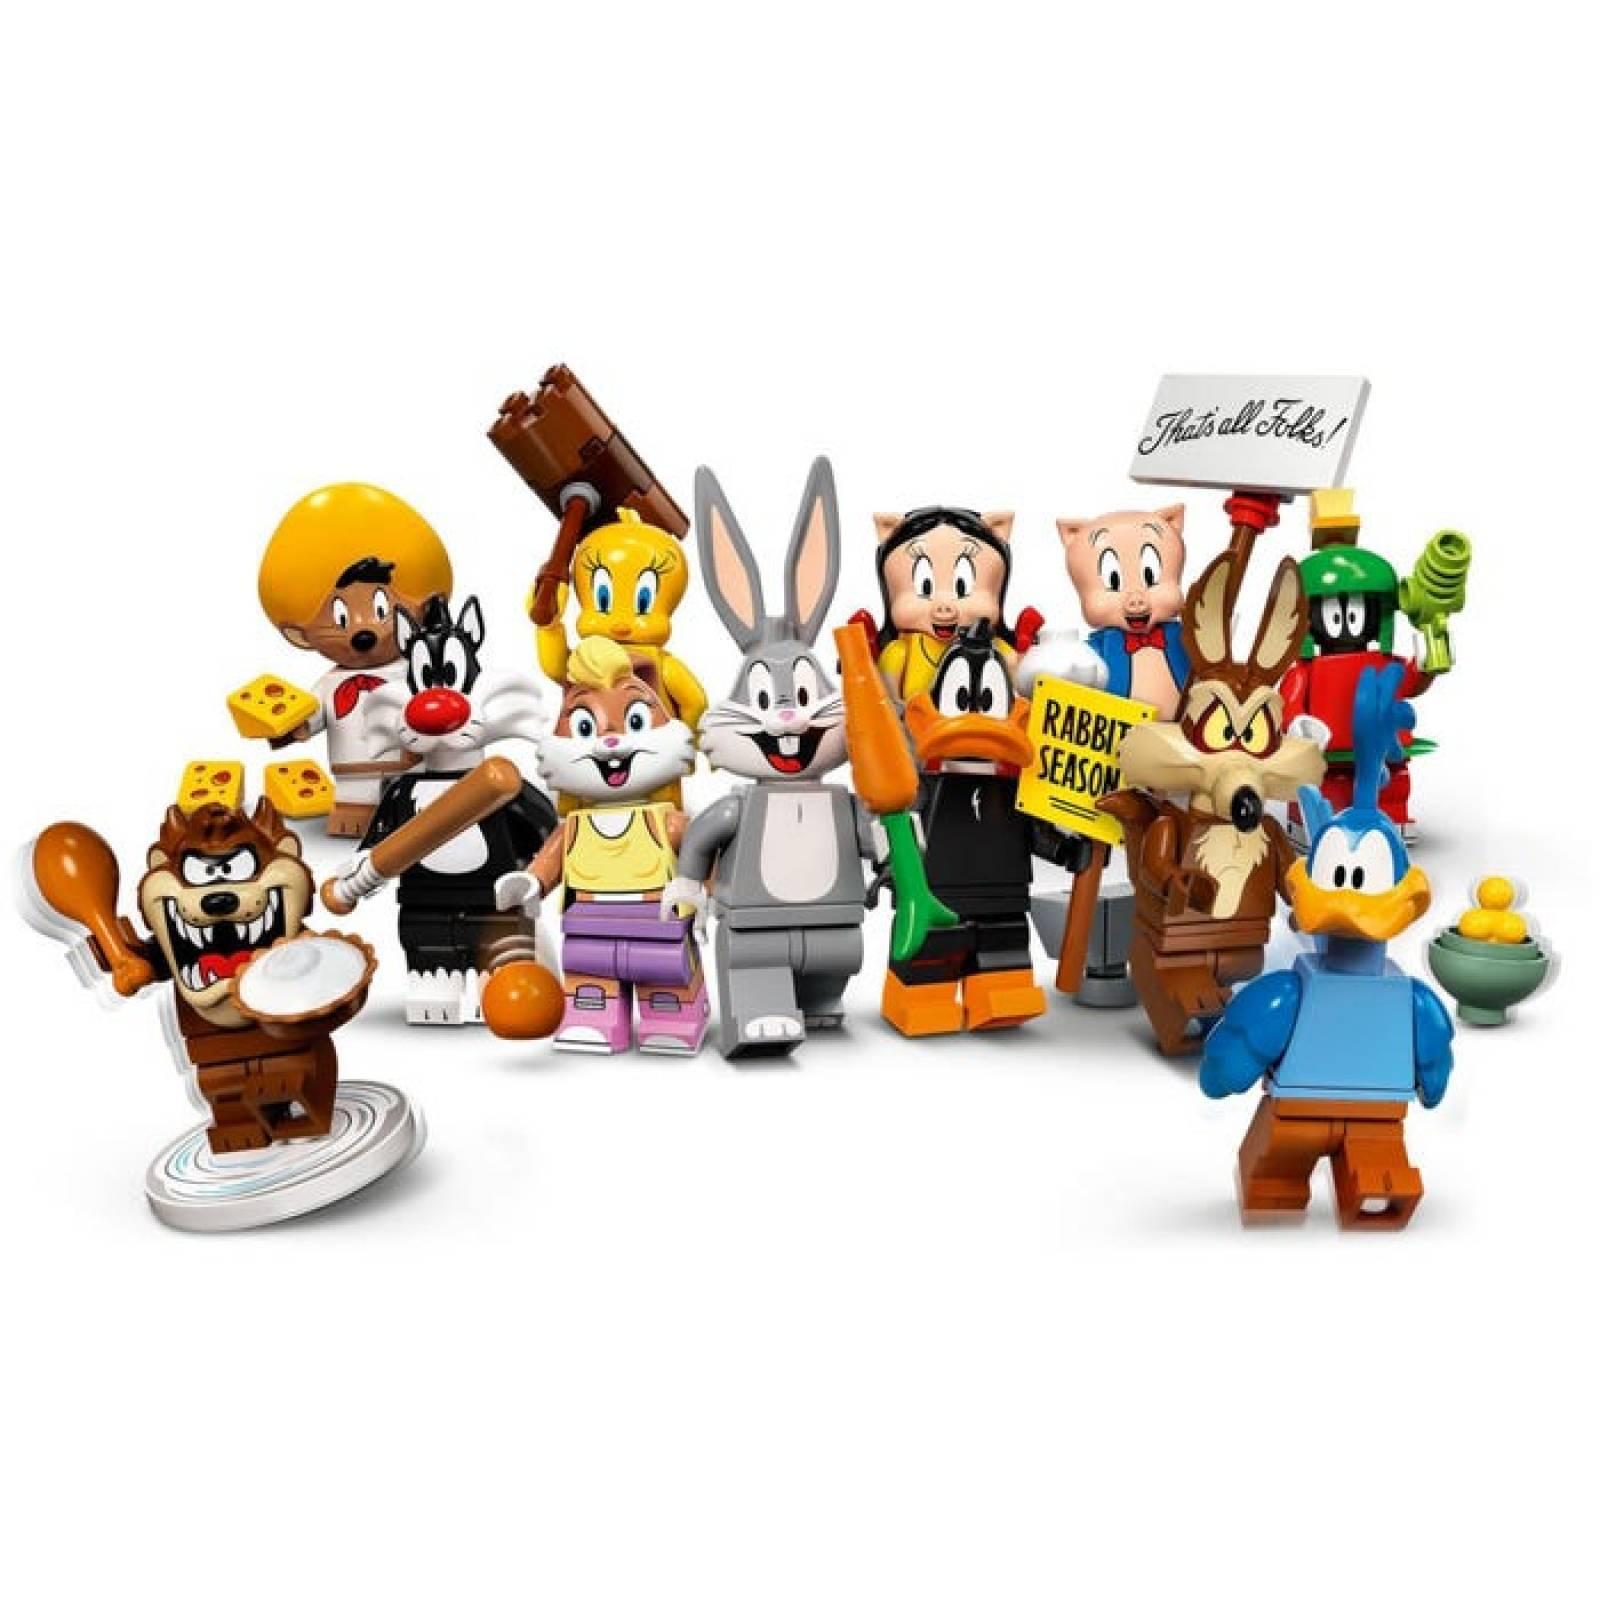 LEGO Minifigures Looney Tunes 71030 thumbnails